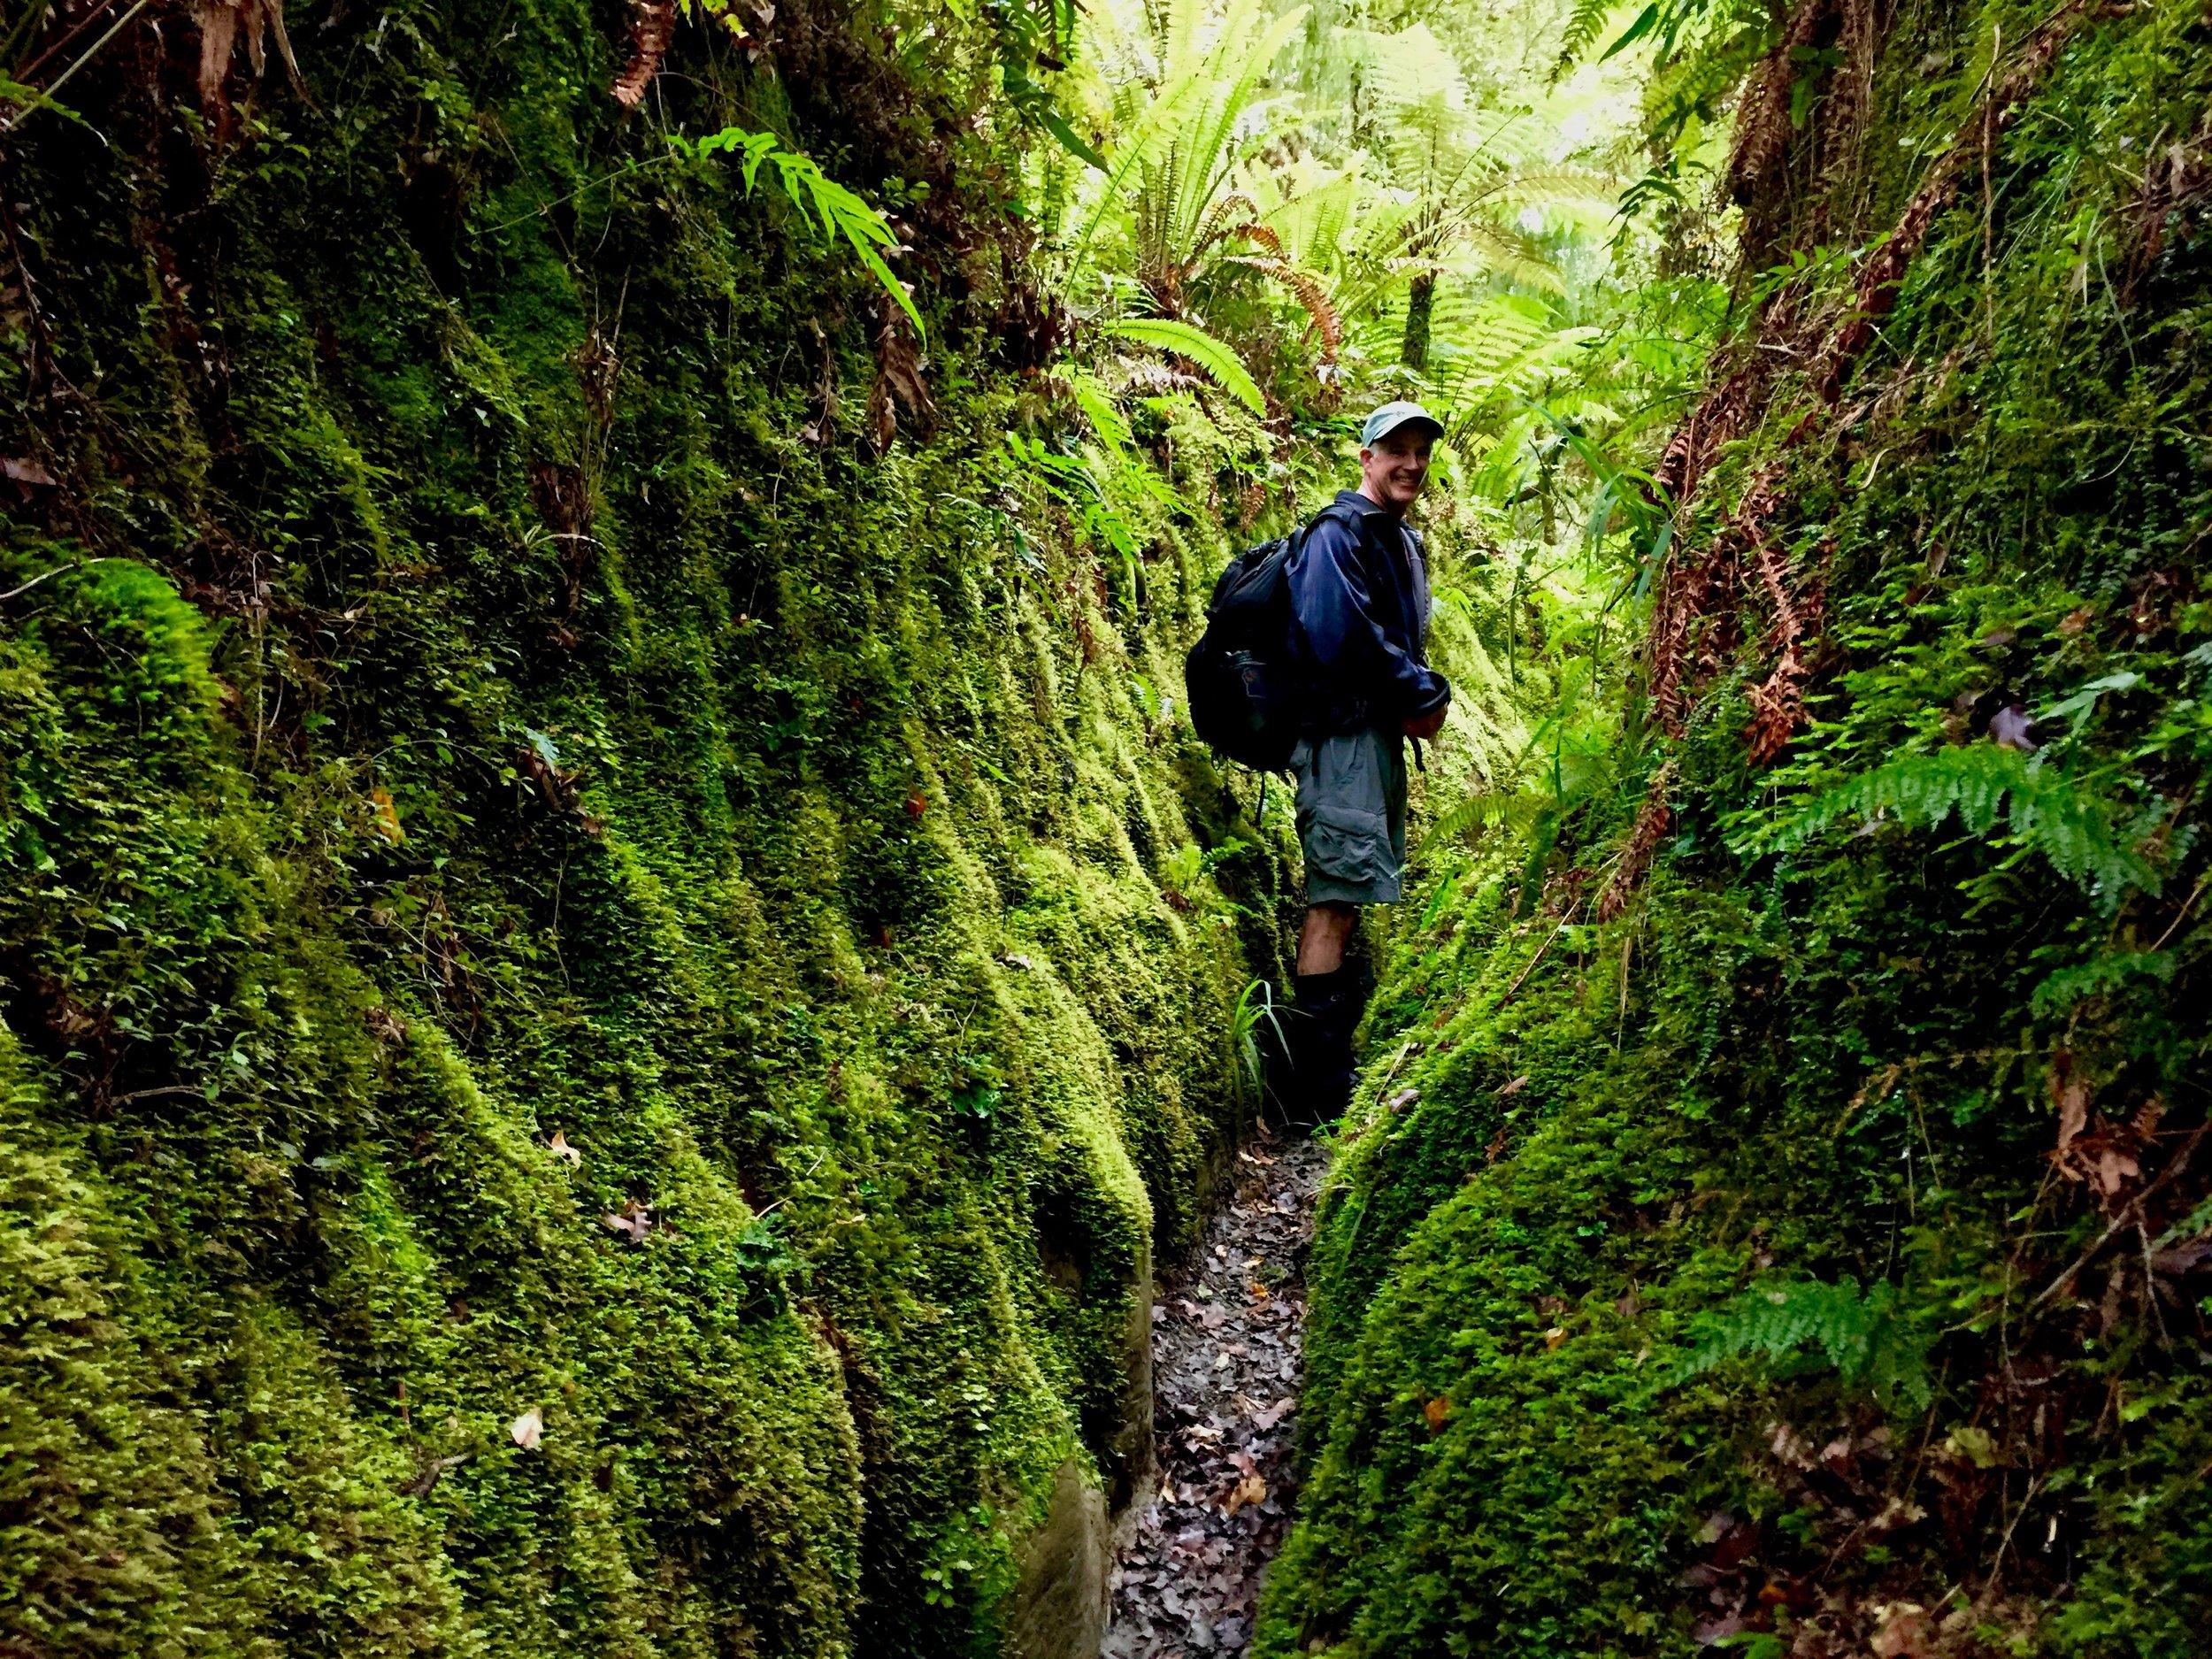 Hiking through New Zealand